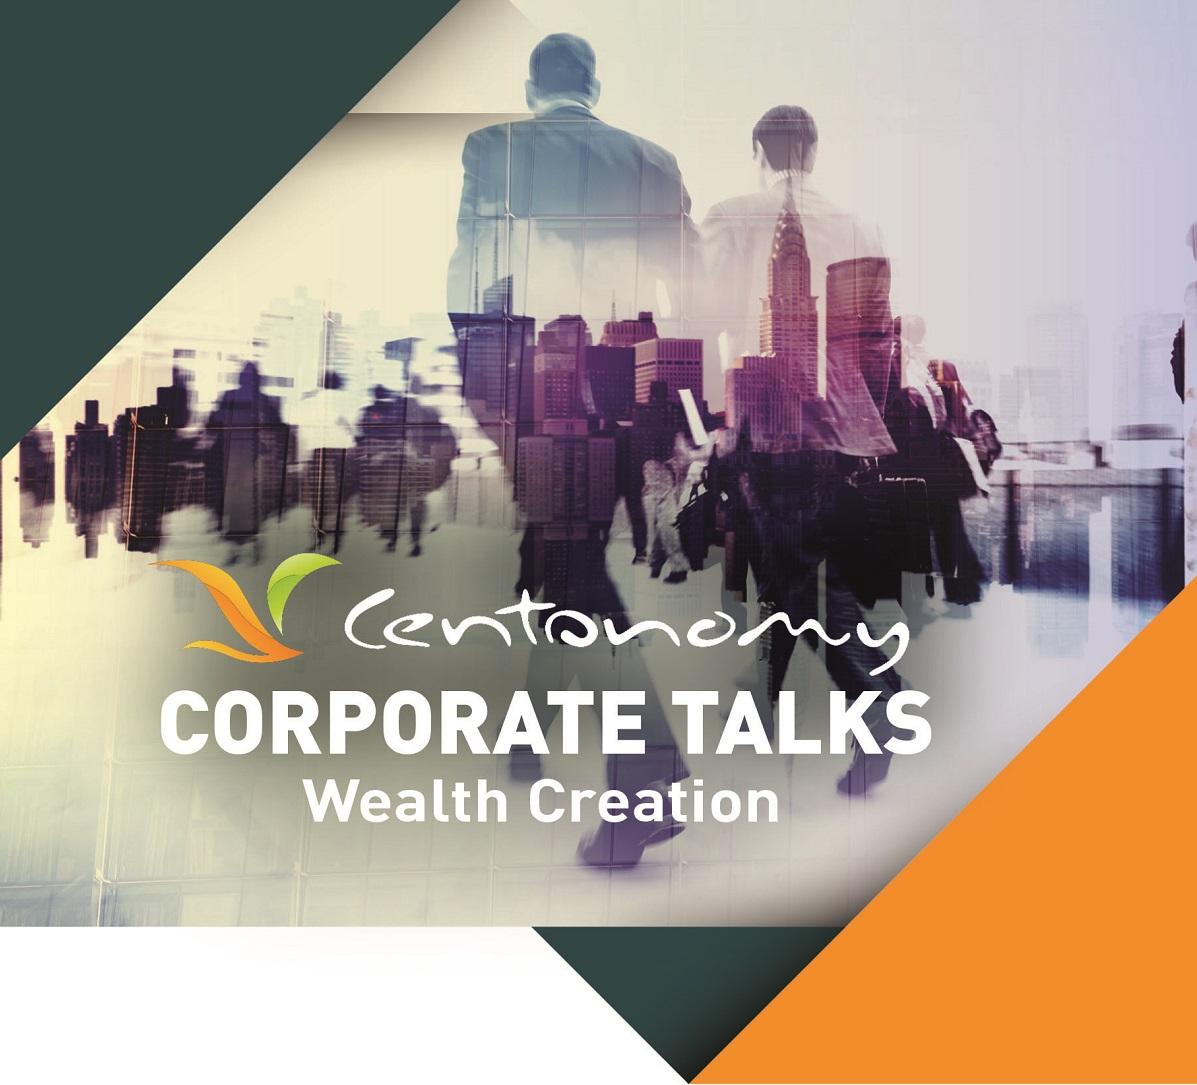 Centonomy Corporate Talks Programs